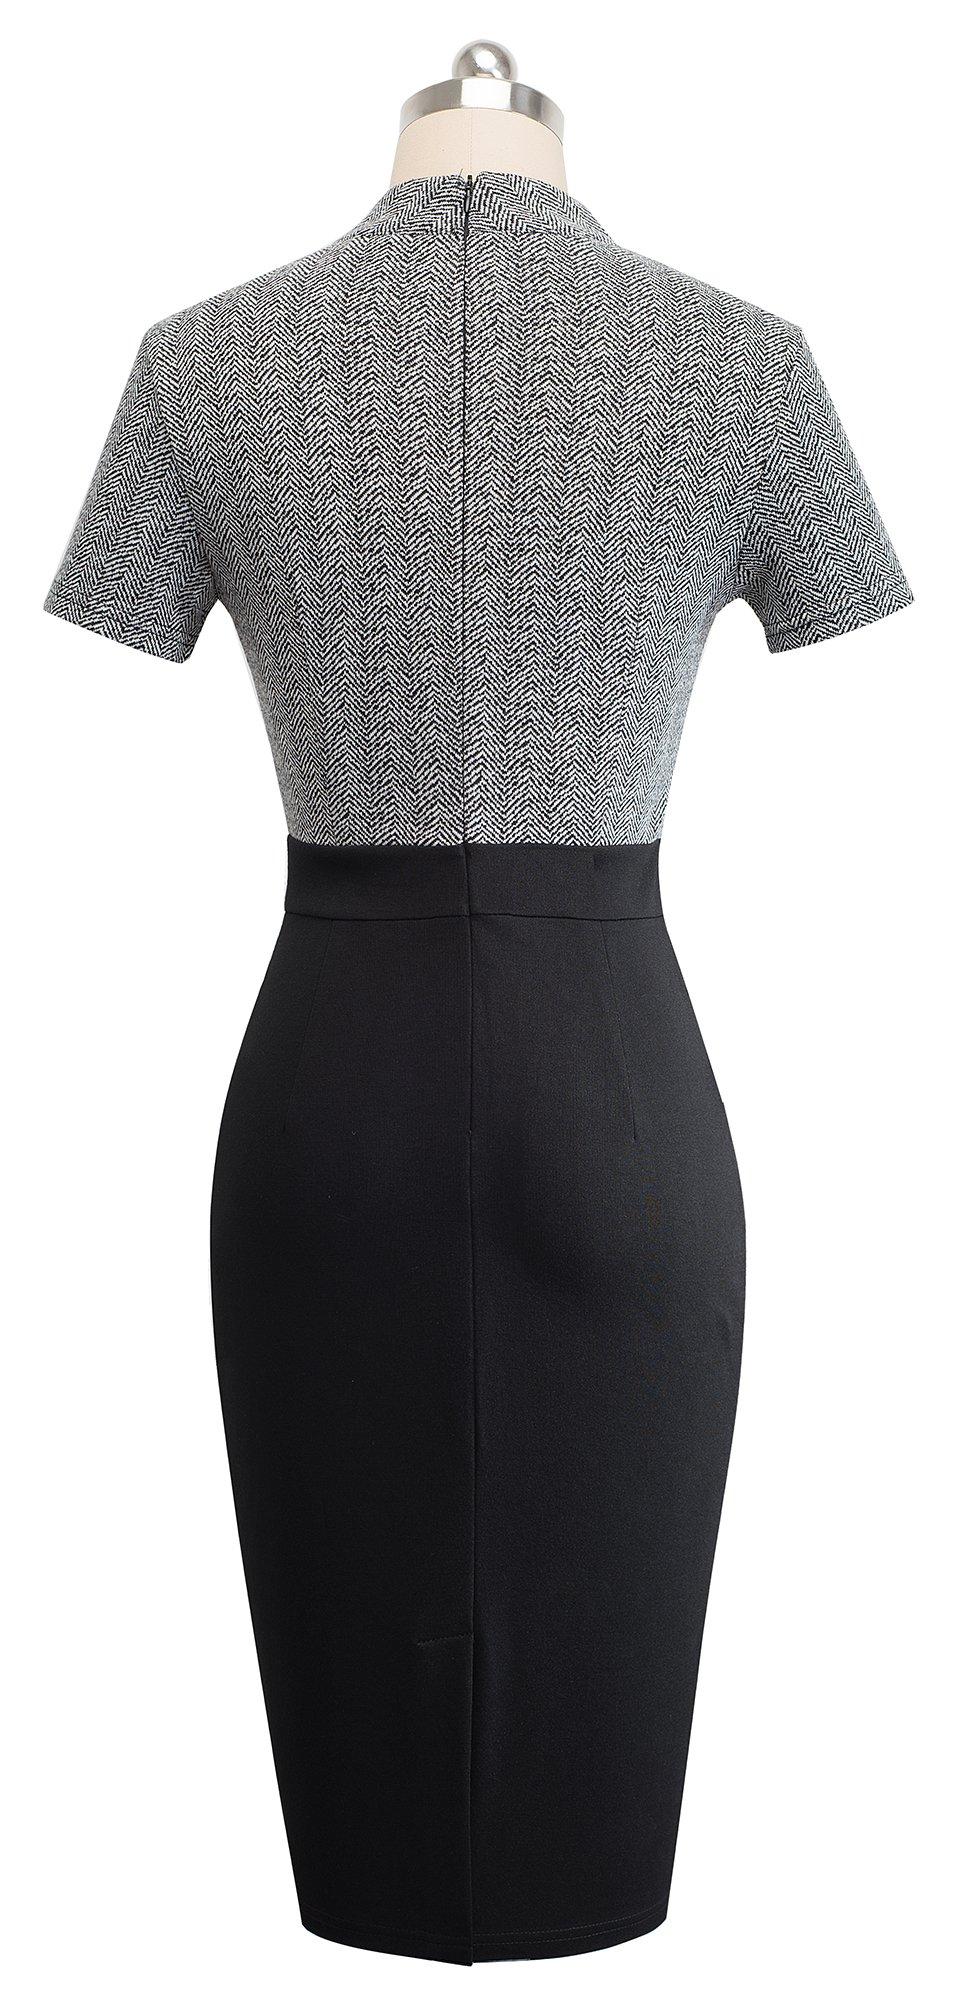 HOMEYEE Women's Short Sleeve Business Church Dress B430 (4, Gray) by HOMEYEE (Image #3)